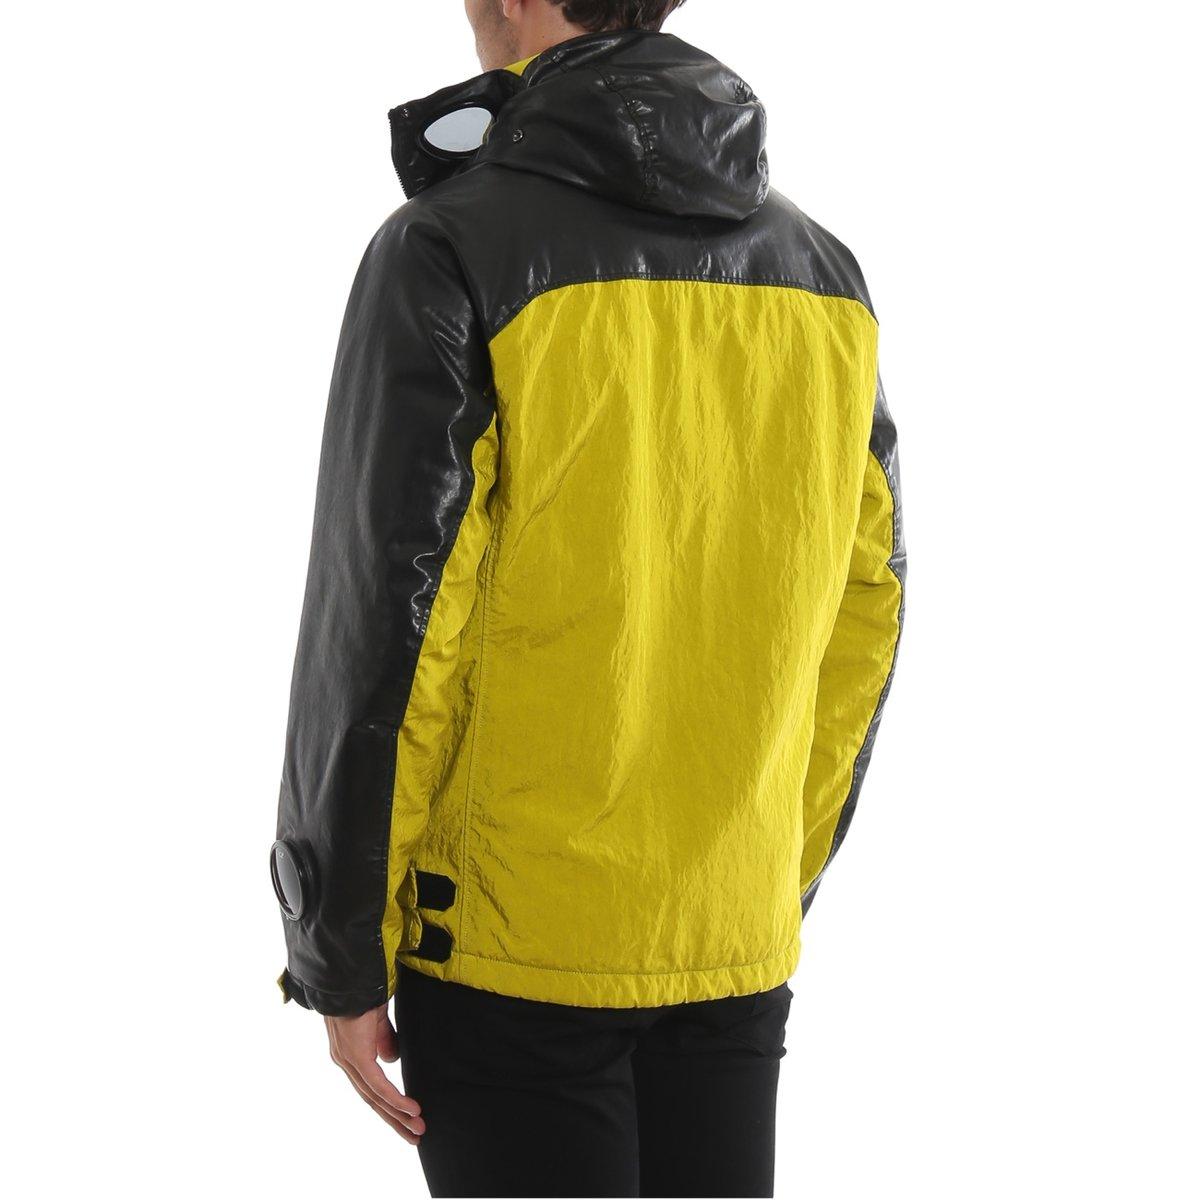 la-mille-quartz-goggle-padded-jacket-shop-online-c.p.-company-00000171748f00s004.jpg